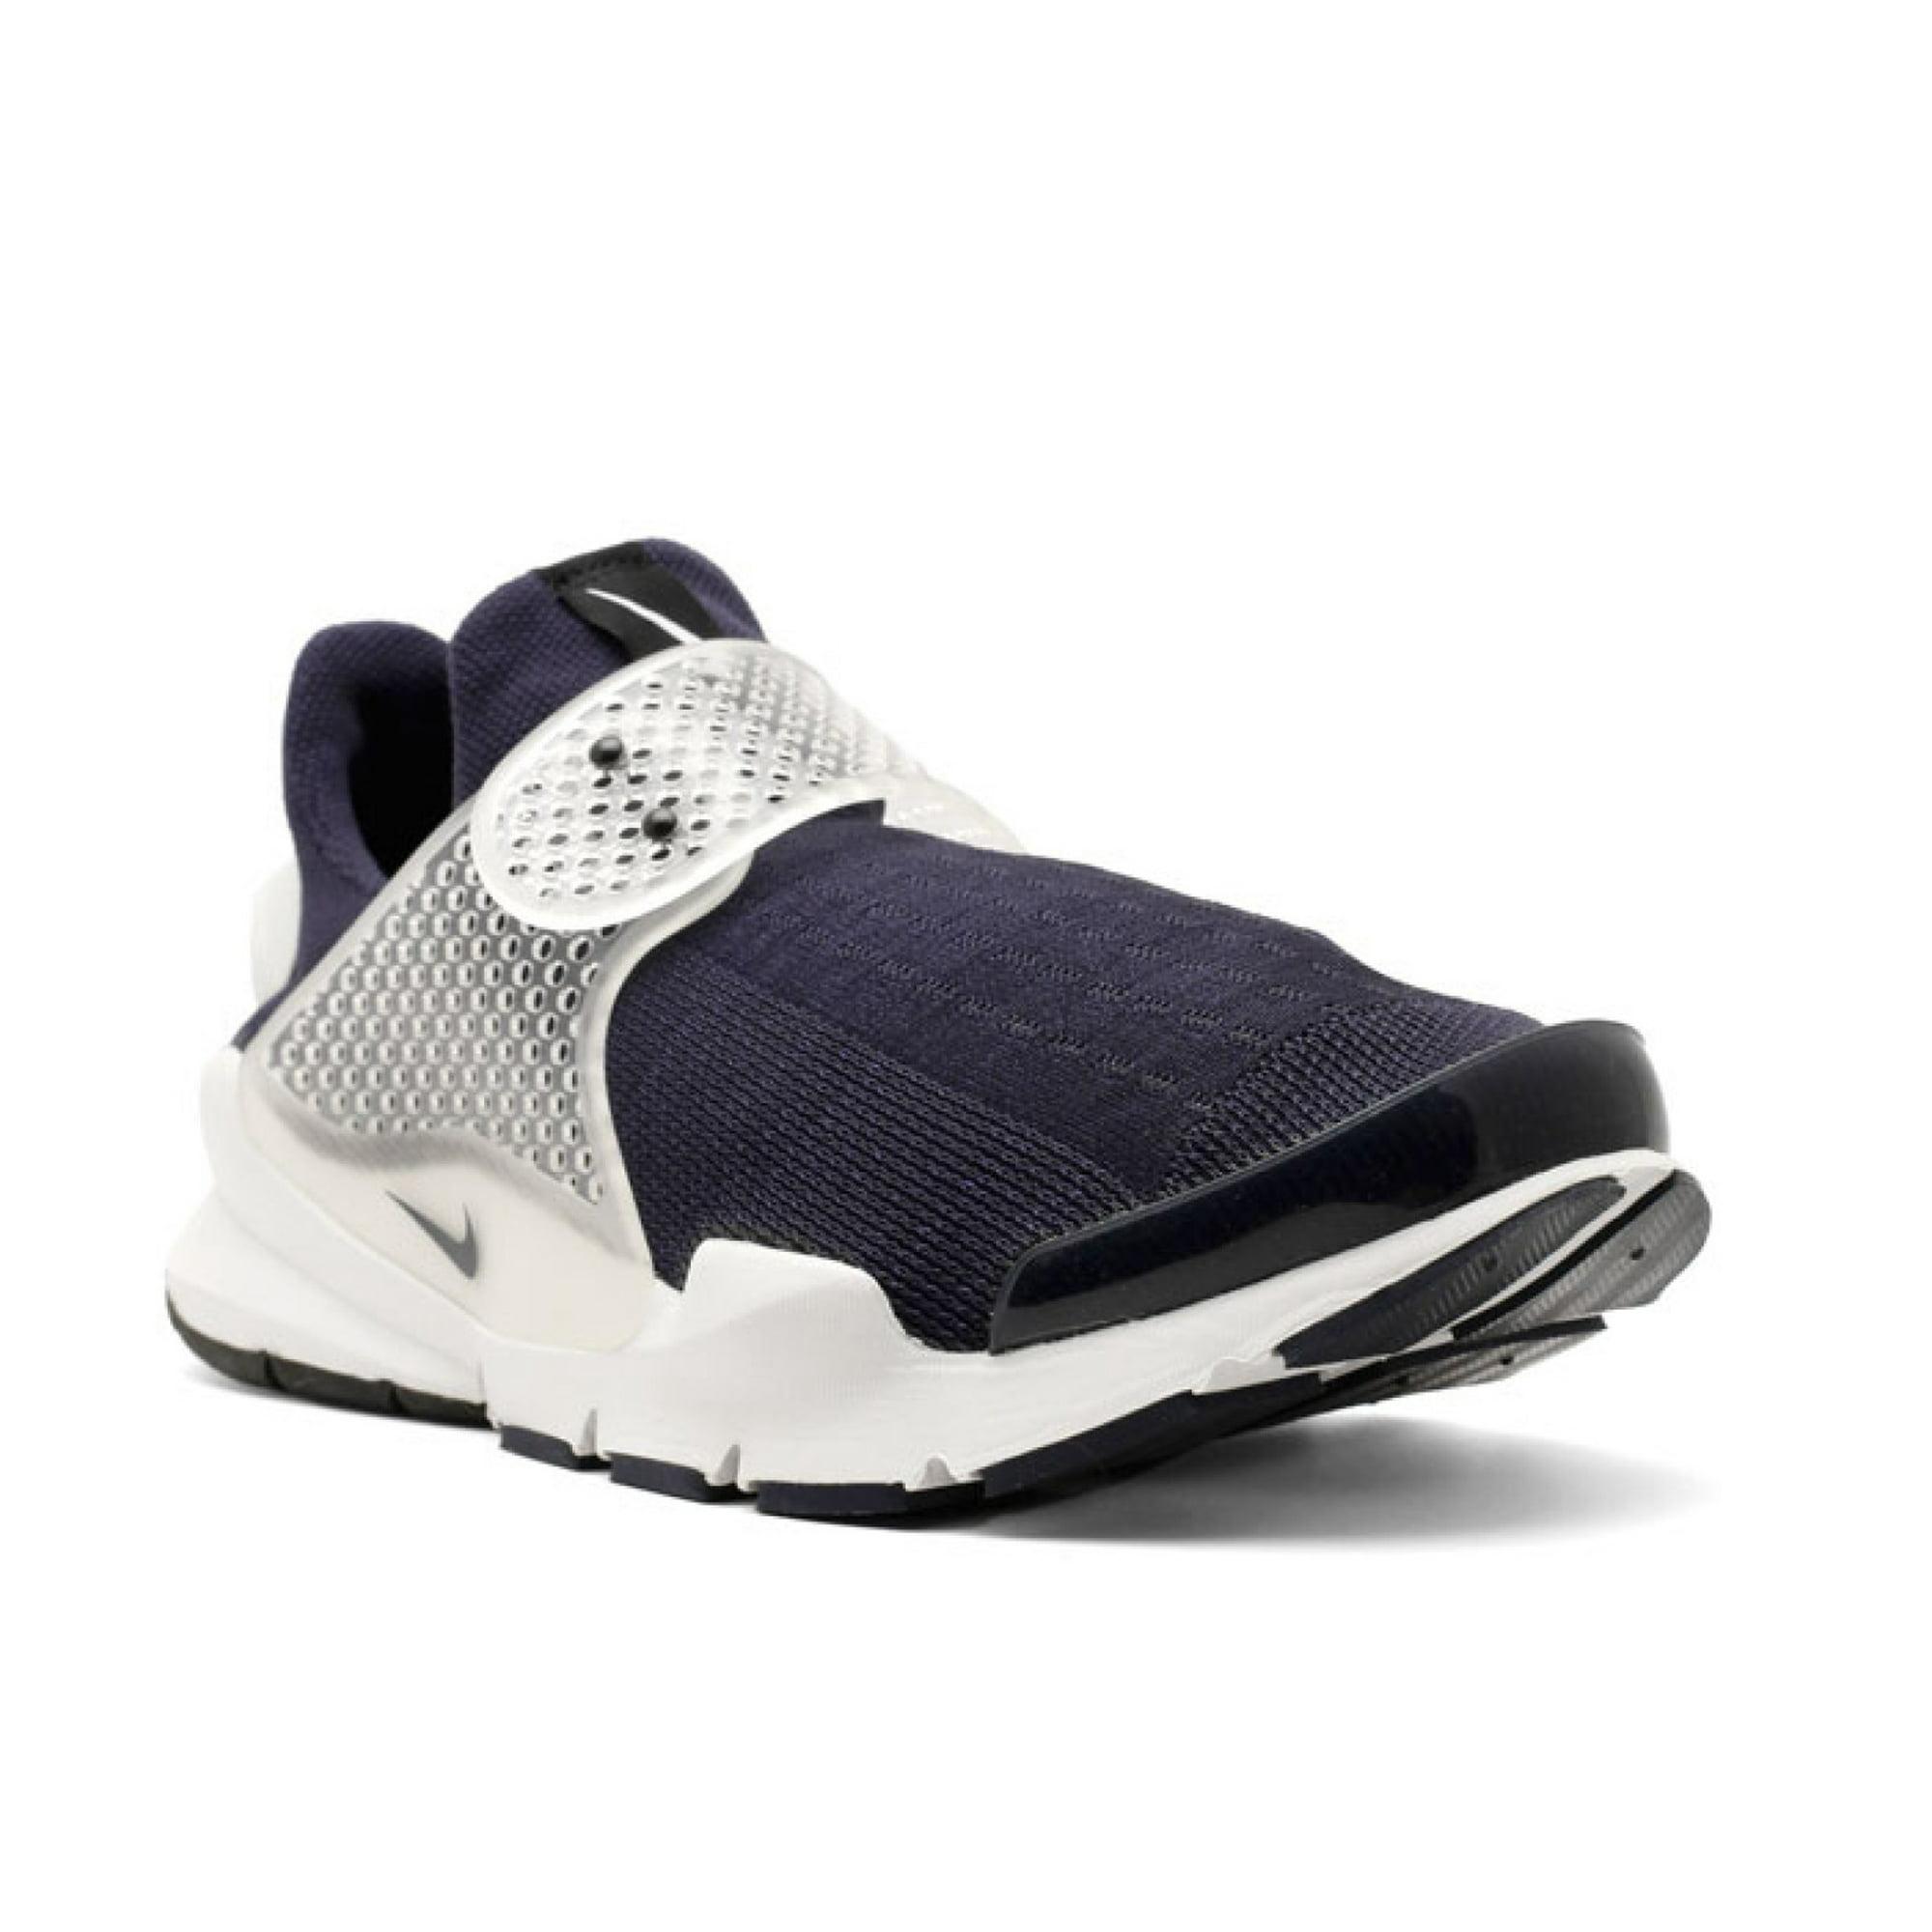 watch 12dac 9ed0b Nike - Men - Sock Dart Sp/Fragment - 728748-400 - Size 12